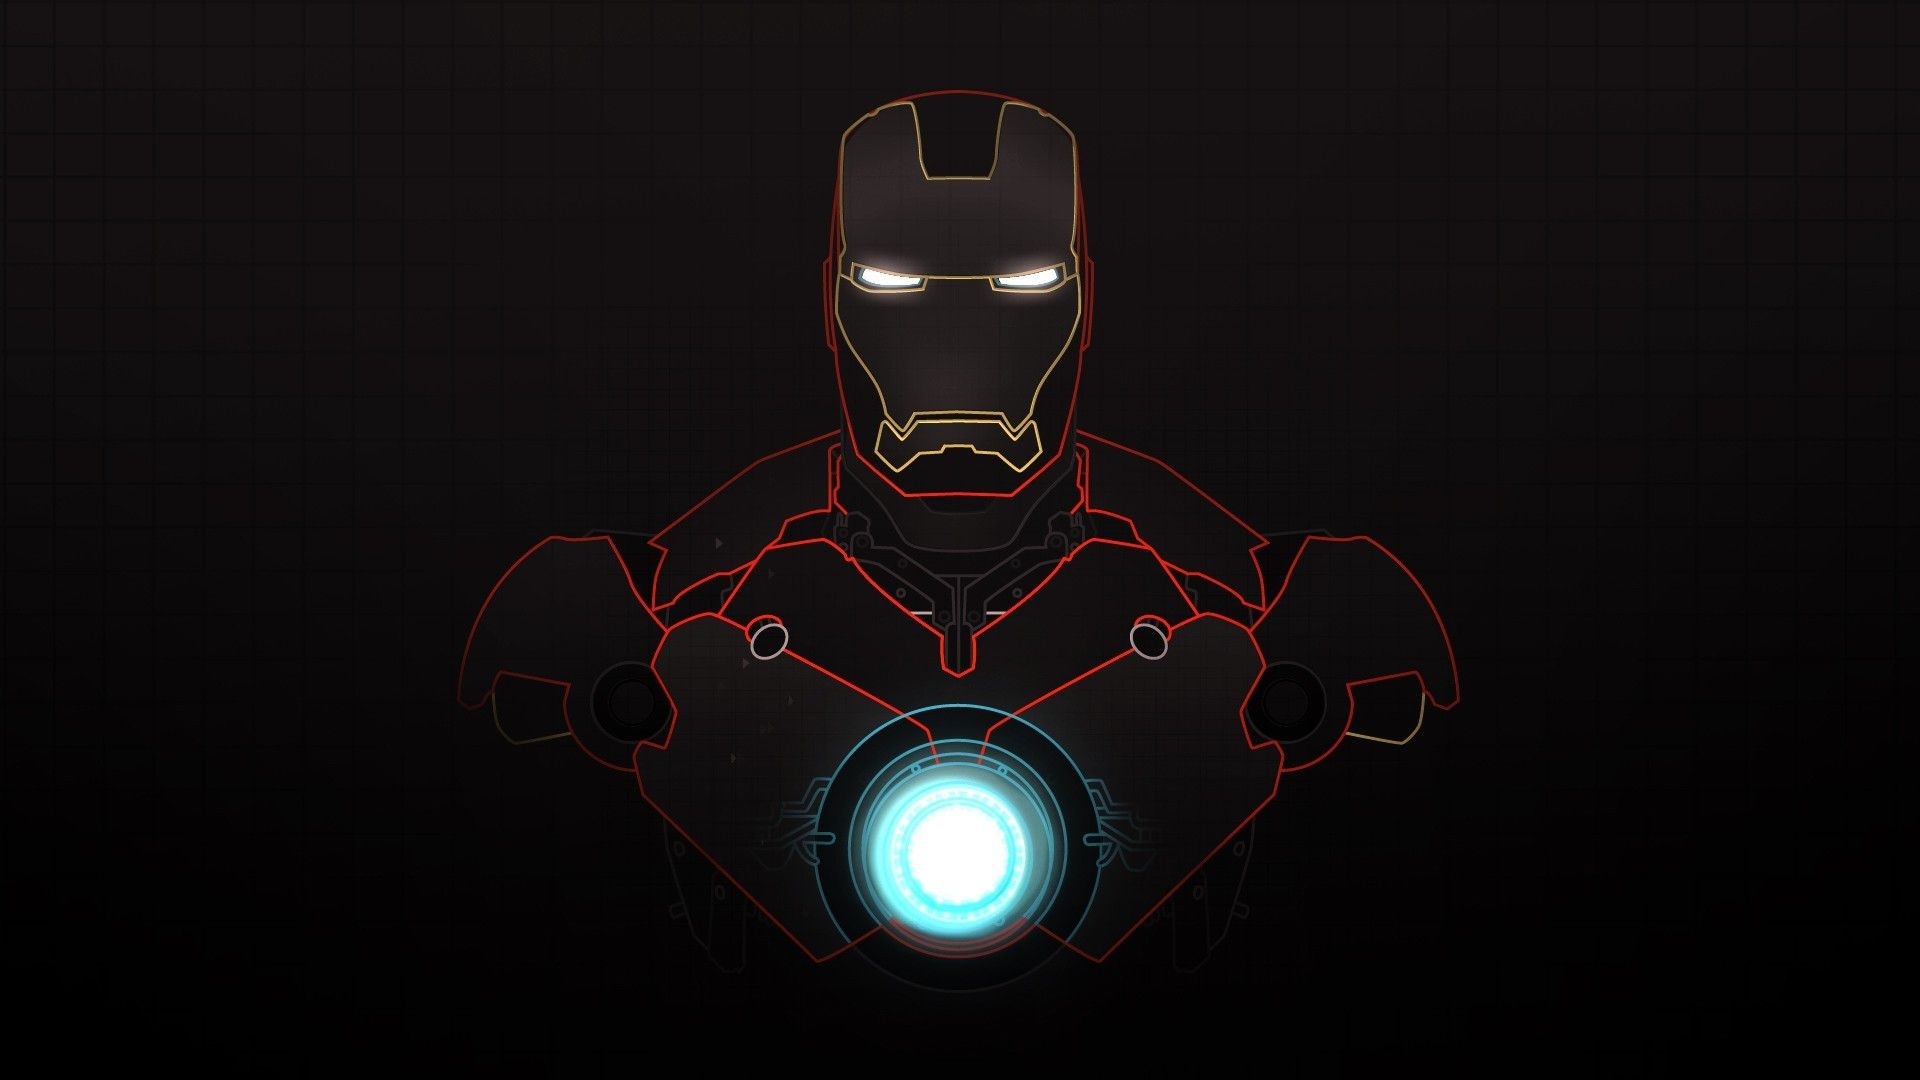 Comic Superheros Iron Man Iron Man Wallpaper Man Wallpaper Iron Man Hd Wallpaper